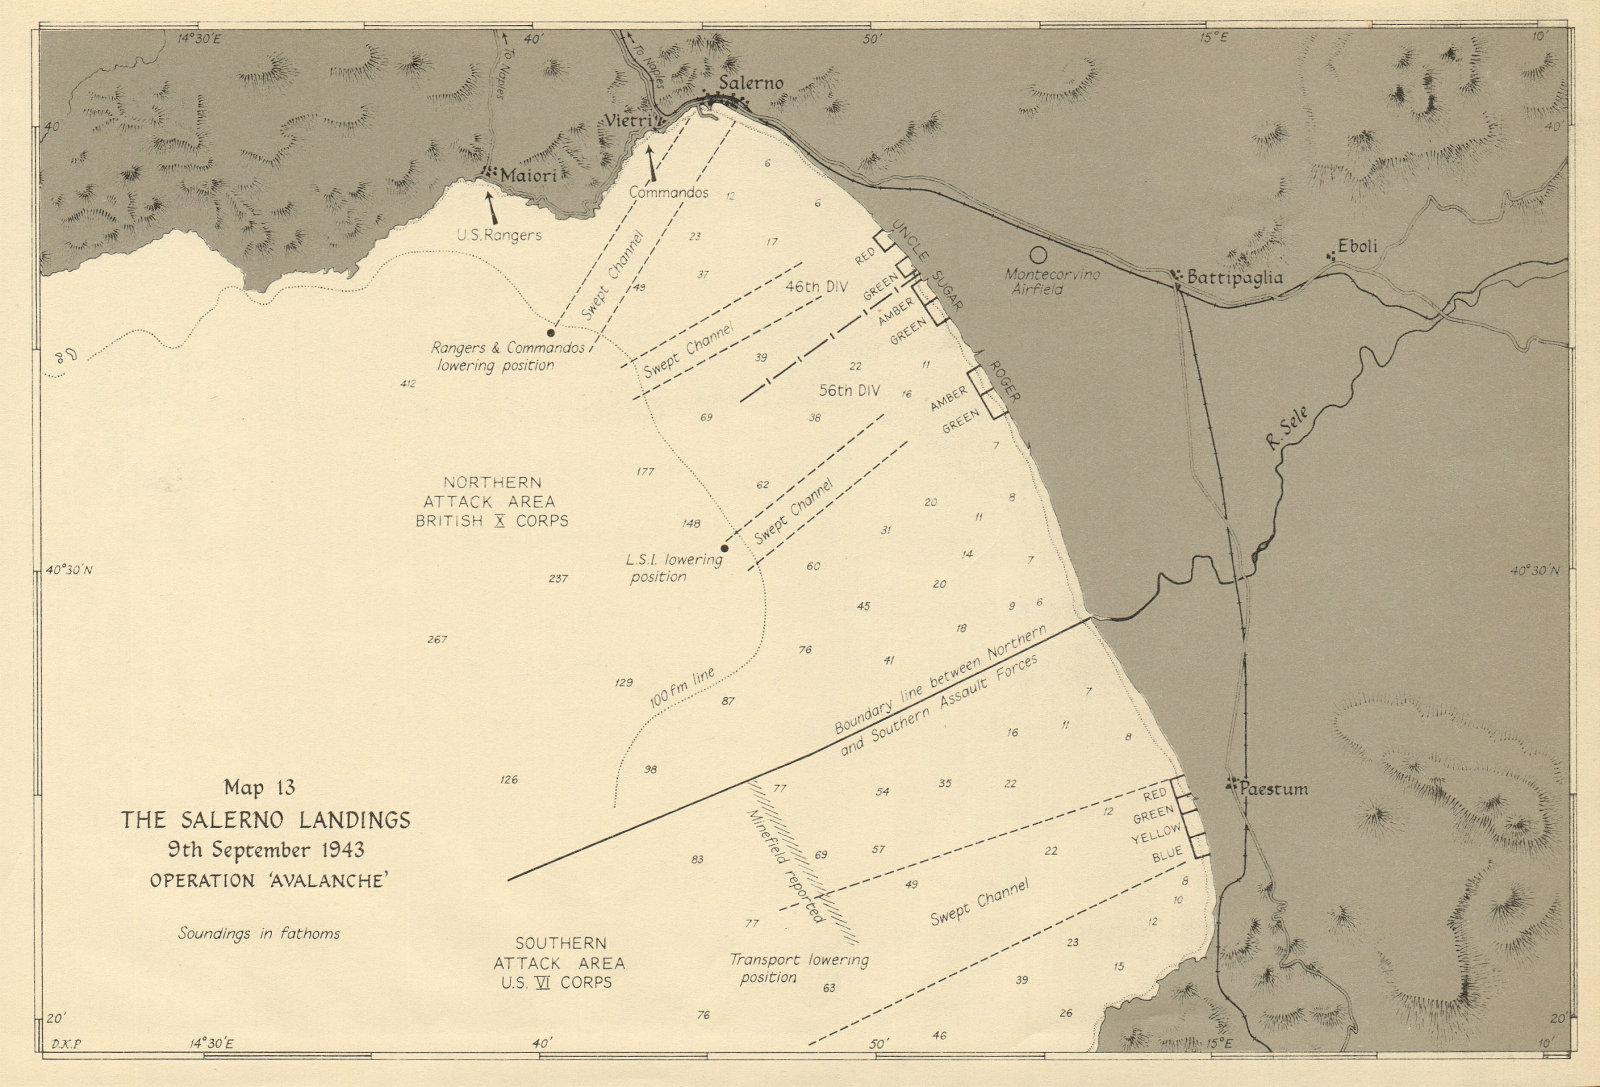 Associate Product Salerno Landings. Operation Avalanche, 9th September 1943. World War 2 1954 map